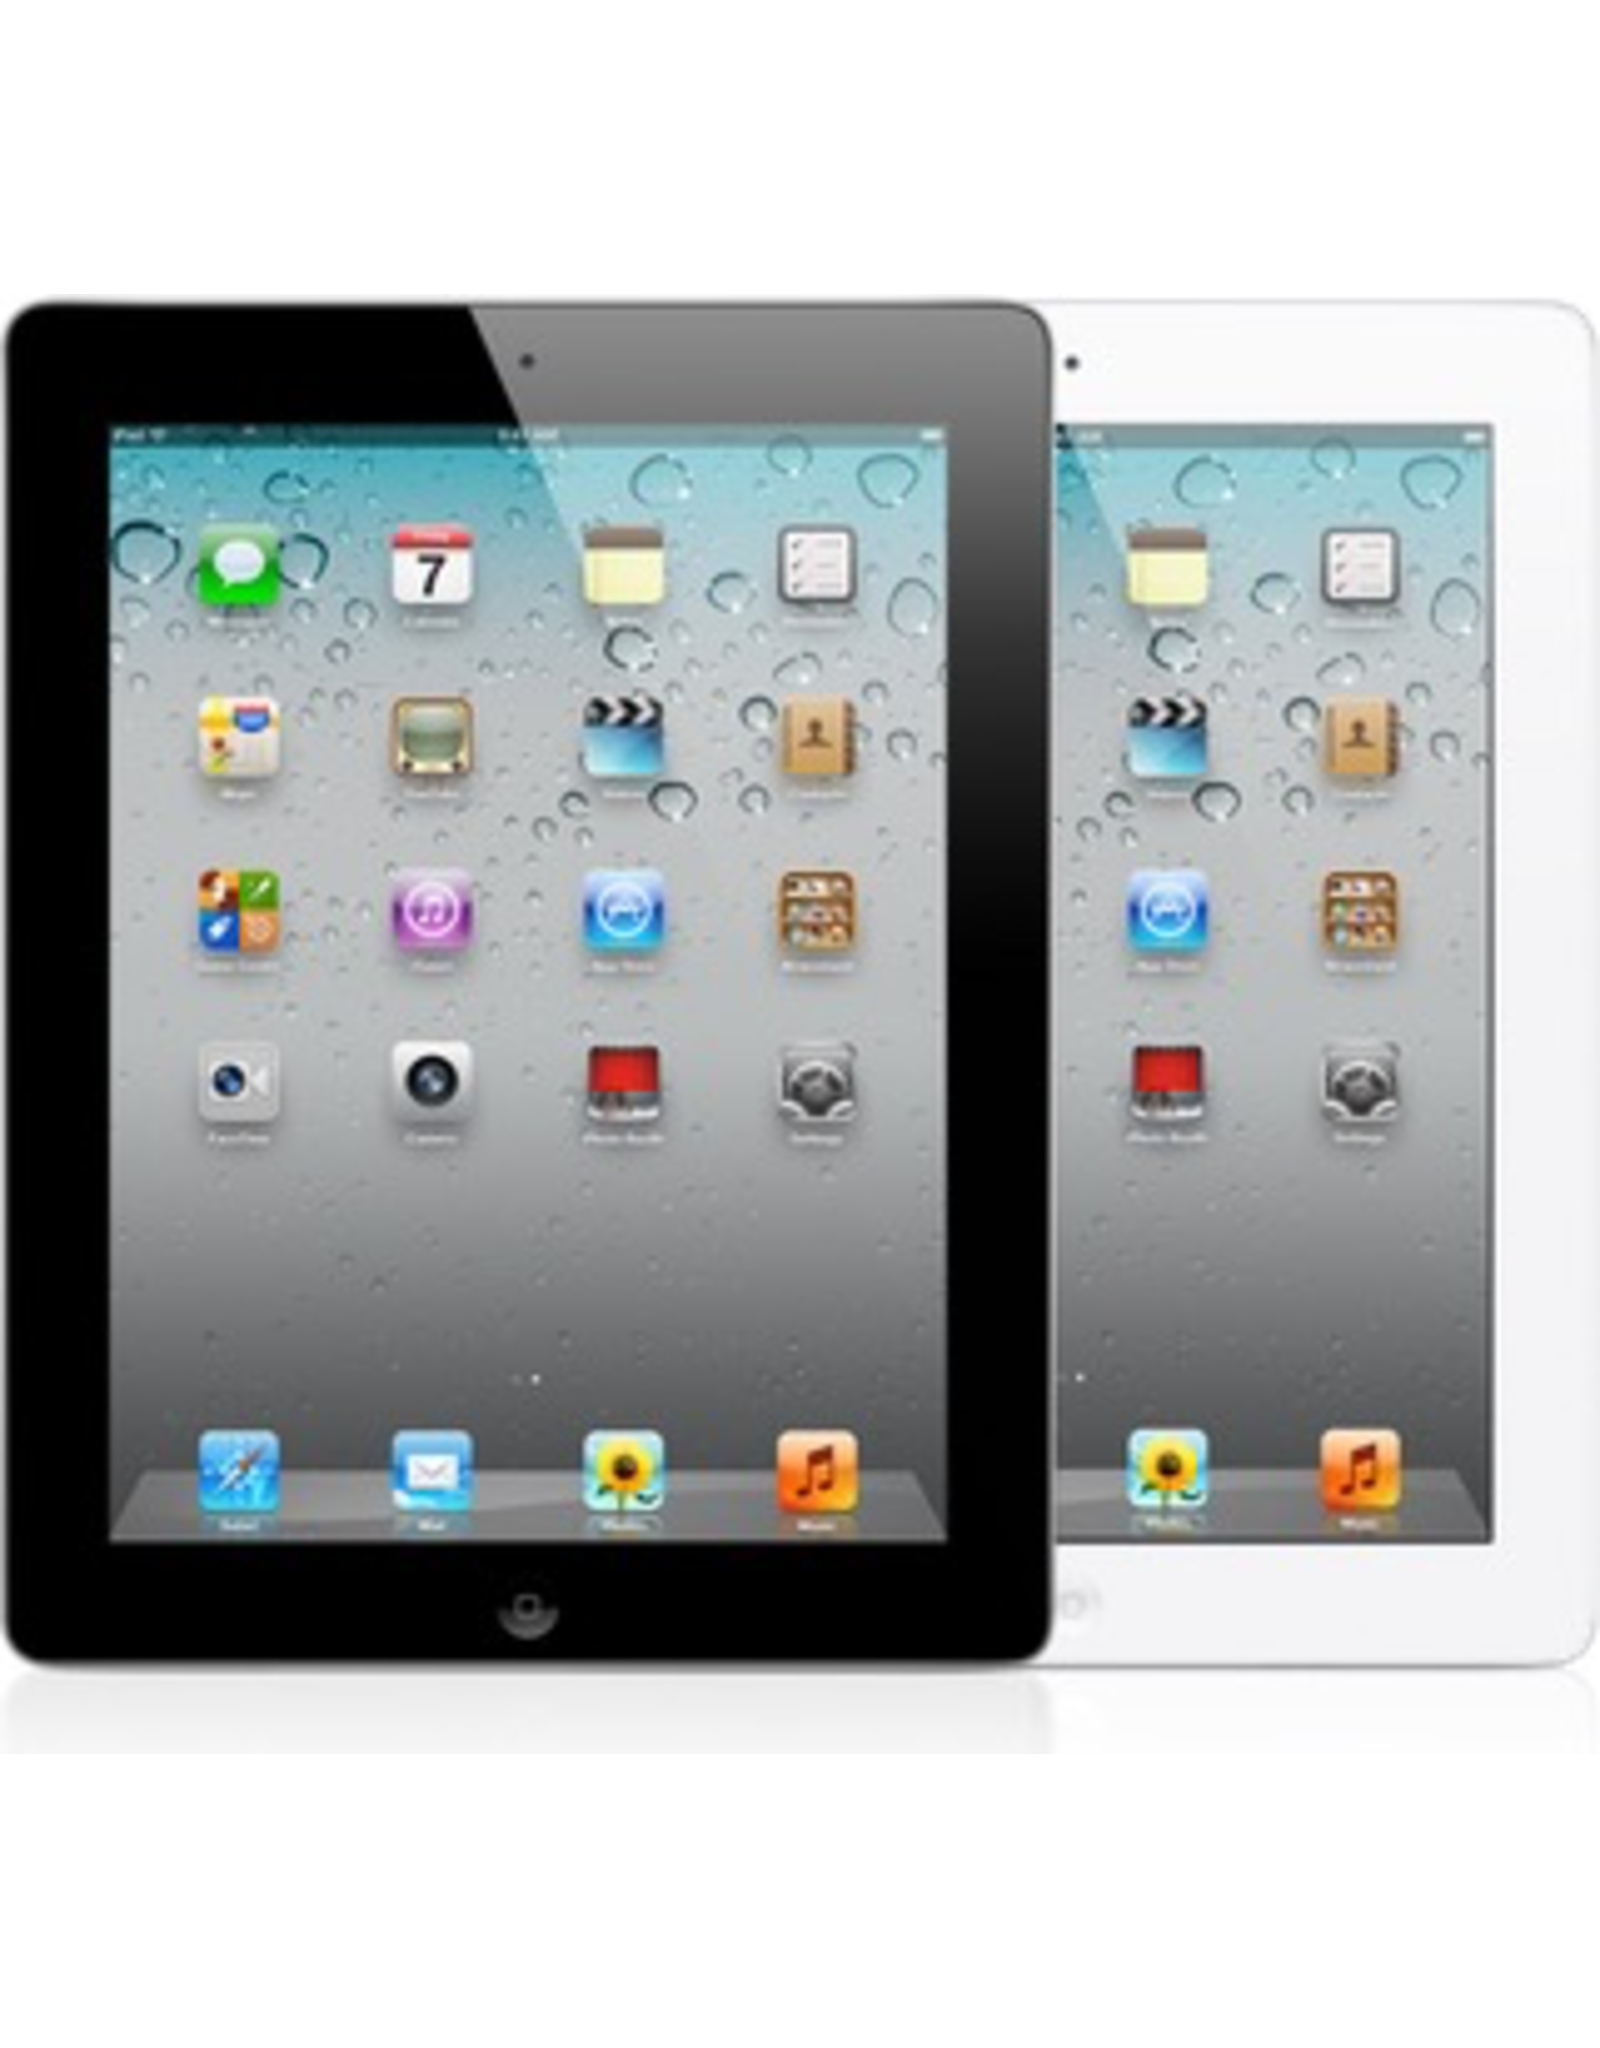 Apple iPad 2,WiFi, 16GB, White - 30 Day Exchange